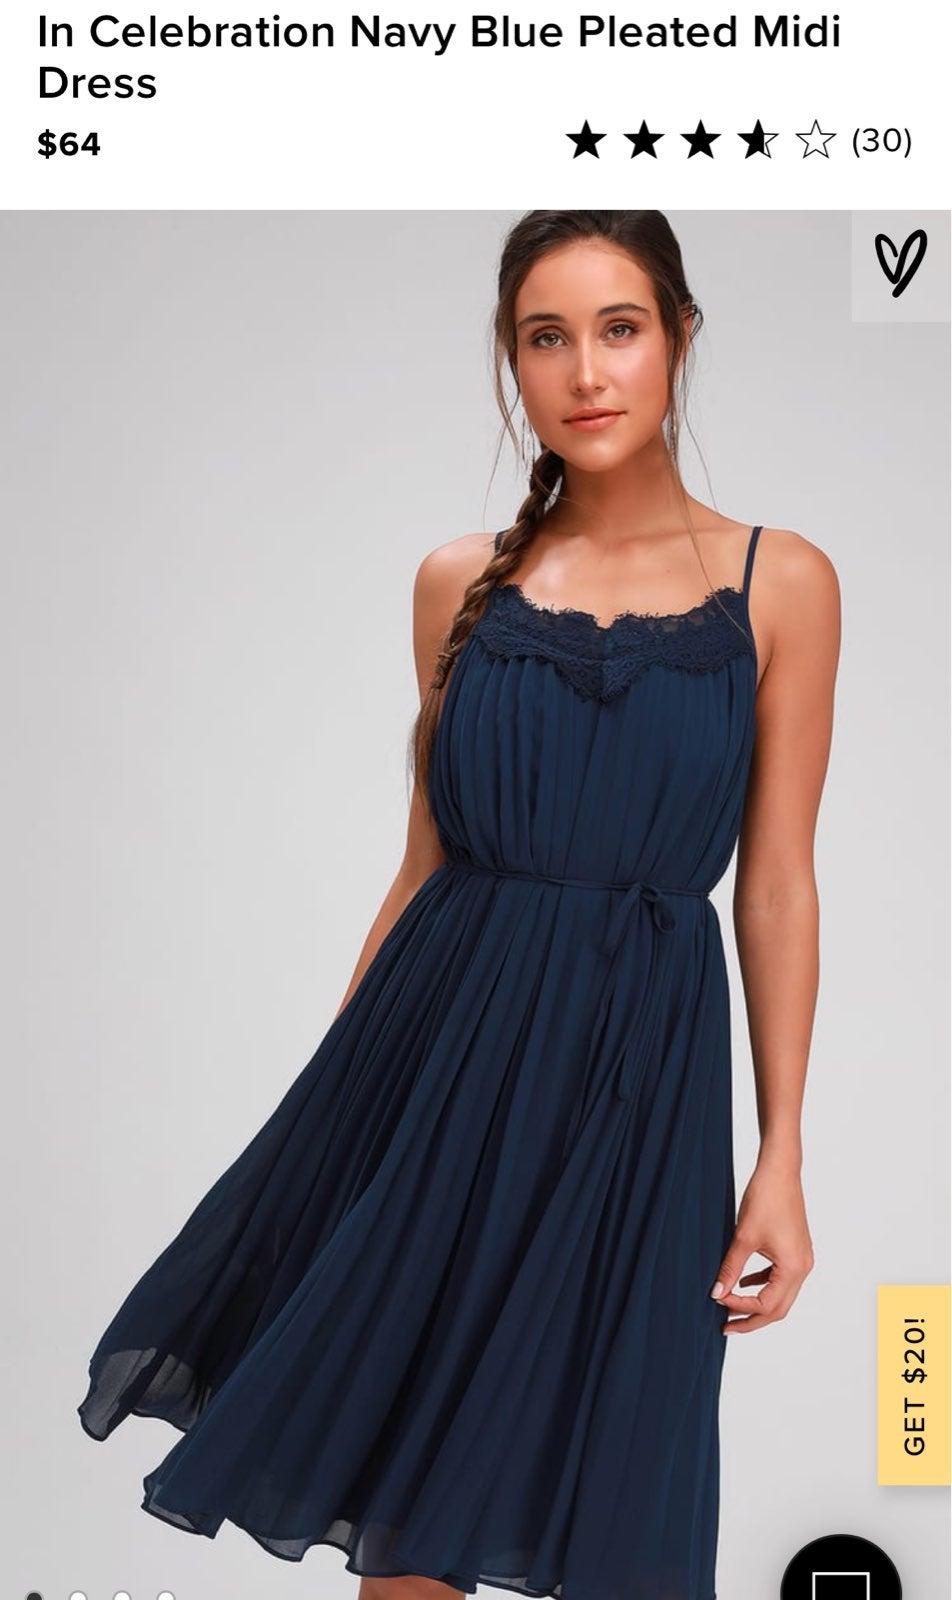 Navy Blue Pleated Midi Dress